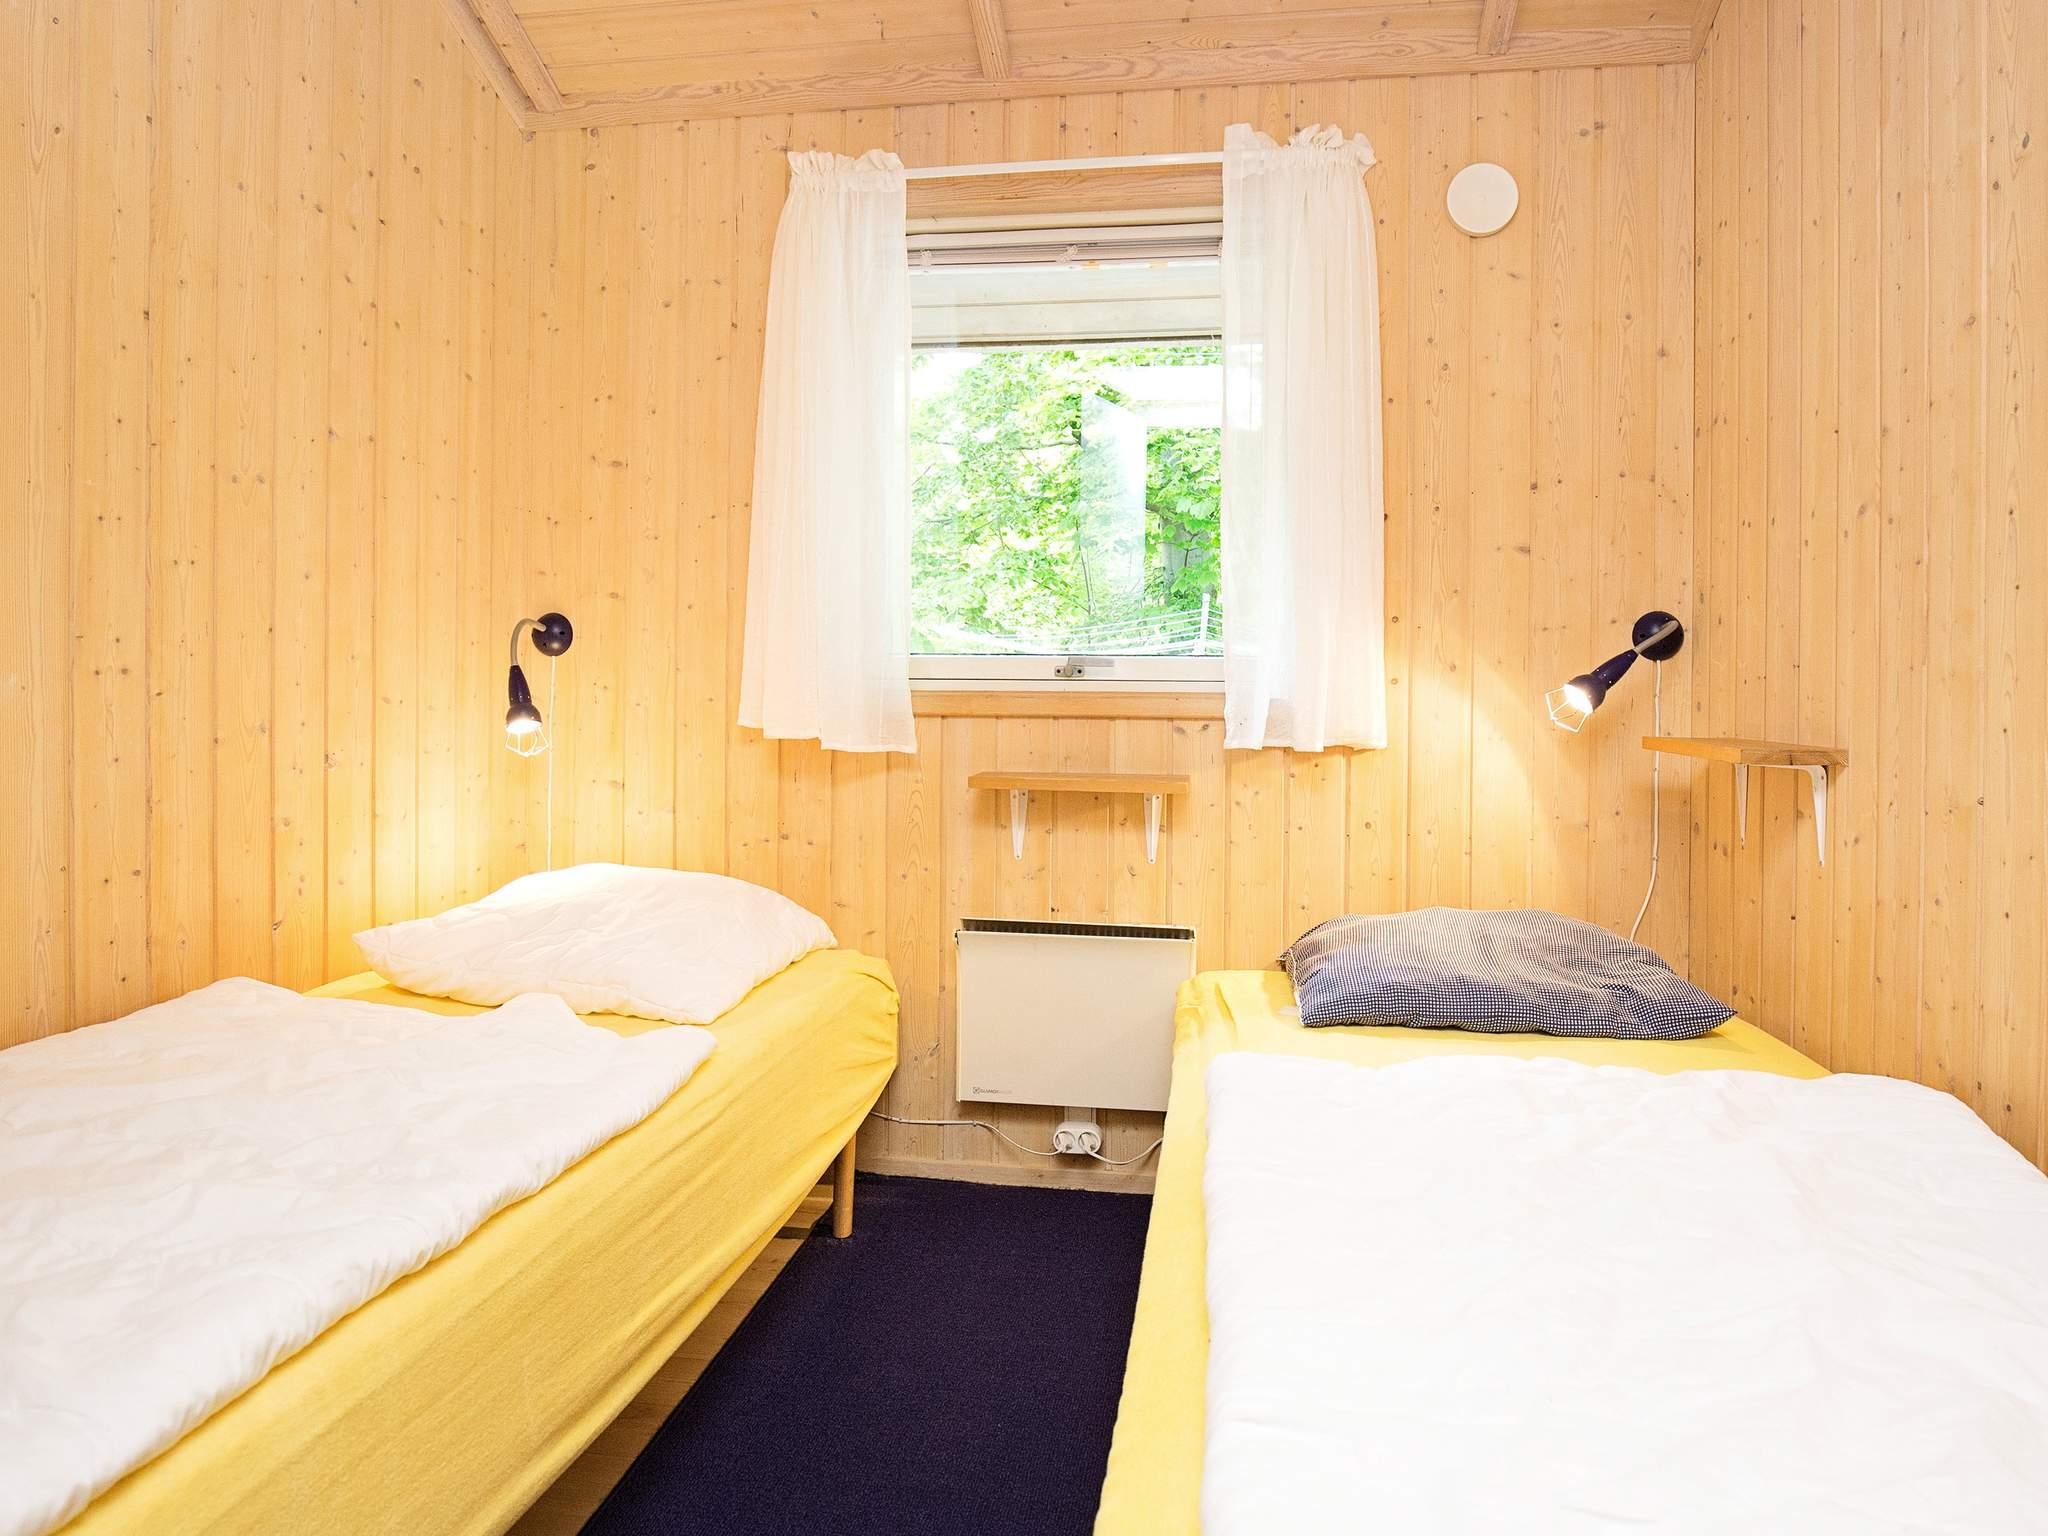 Ferienhaus Hornbæk (87412), Hornbæk, , Nordseeland, Dänemark, Bild 13